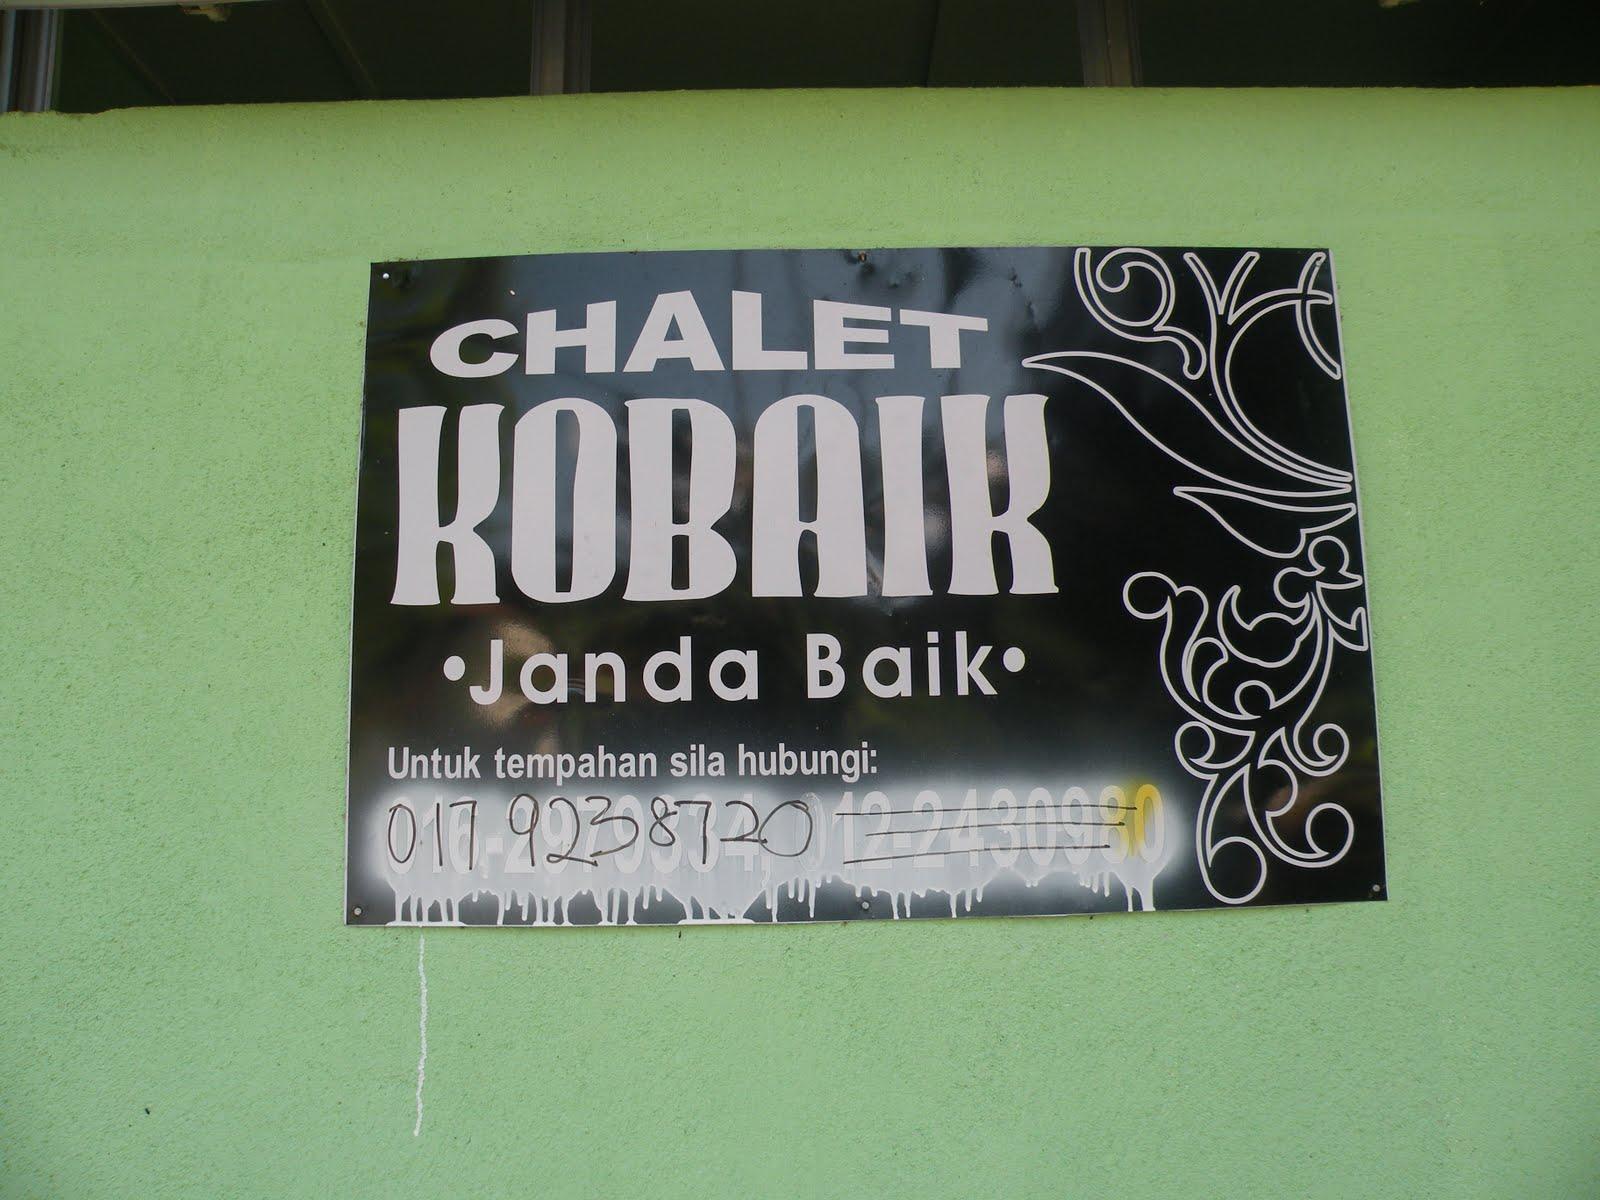 Janda Baik Chalet